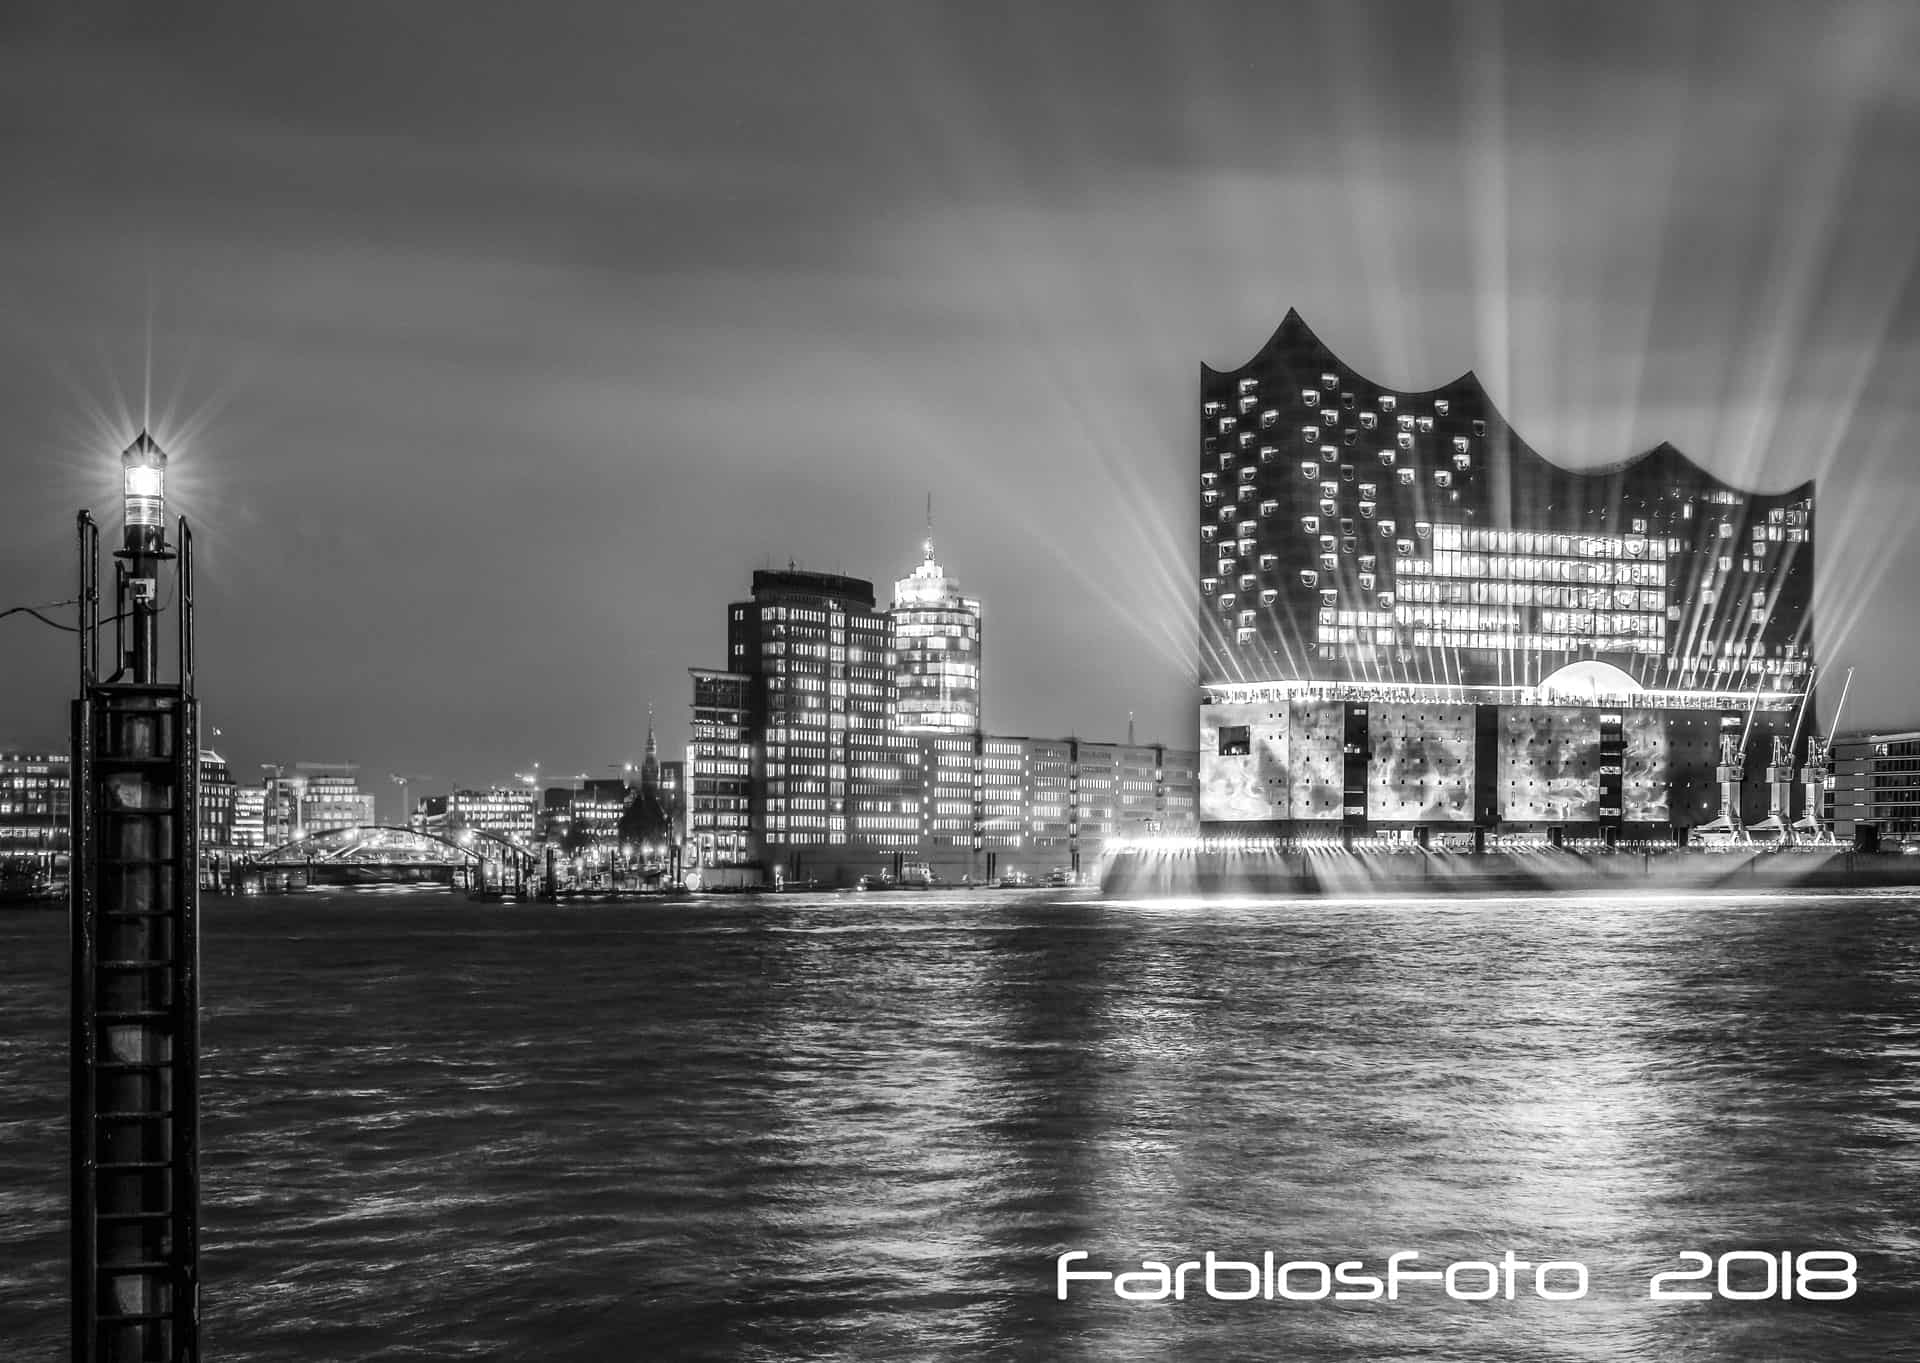 Kalender - FarblosFoto 2018